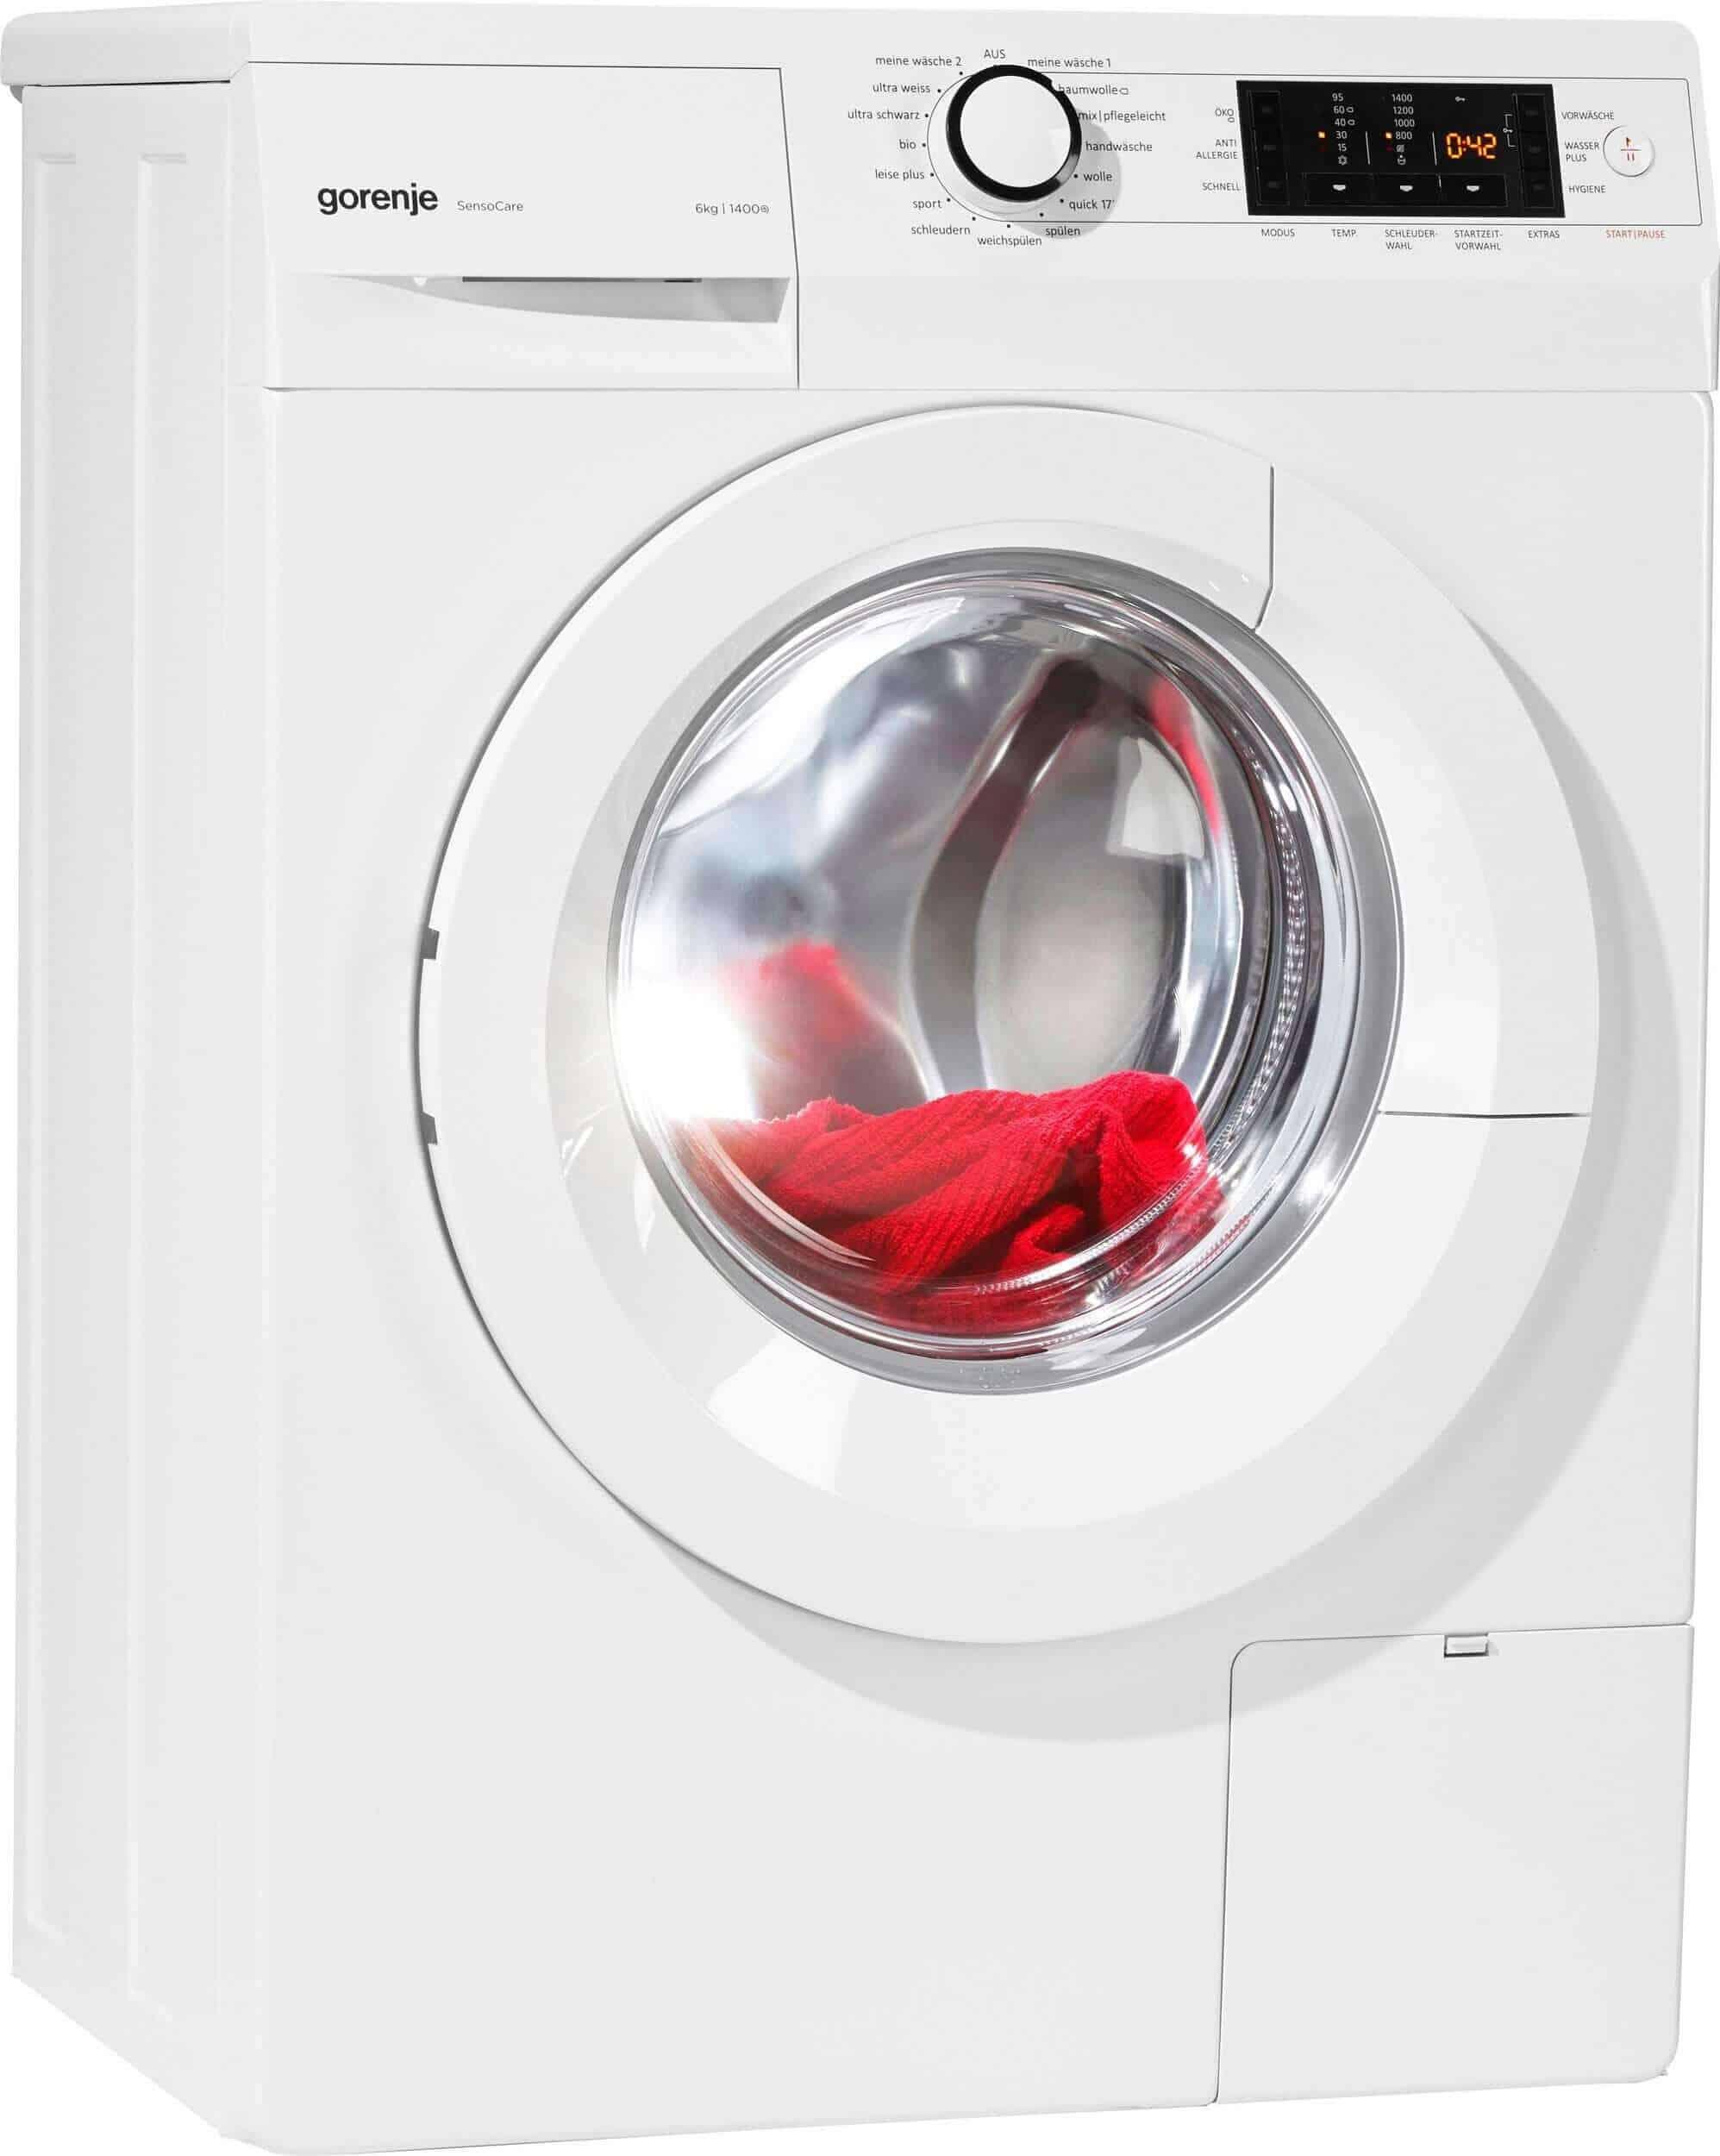 gorenje w 6443 s slim line waschmaschine im test 02 2019. Black Bedroom Furniture Sets. Home Design Ideas